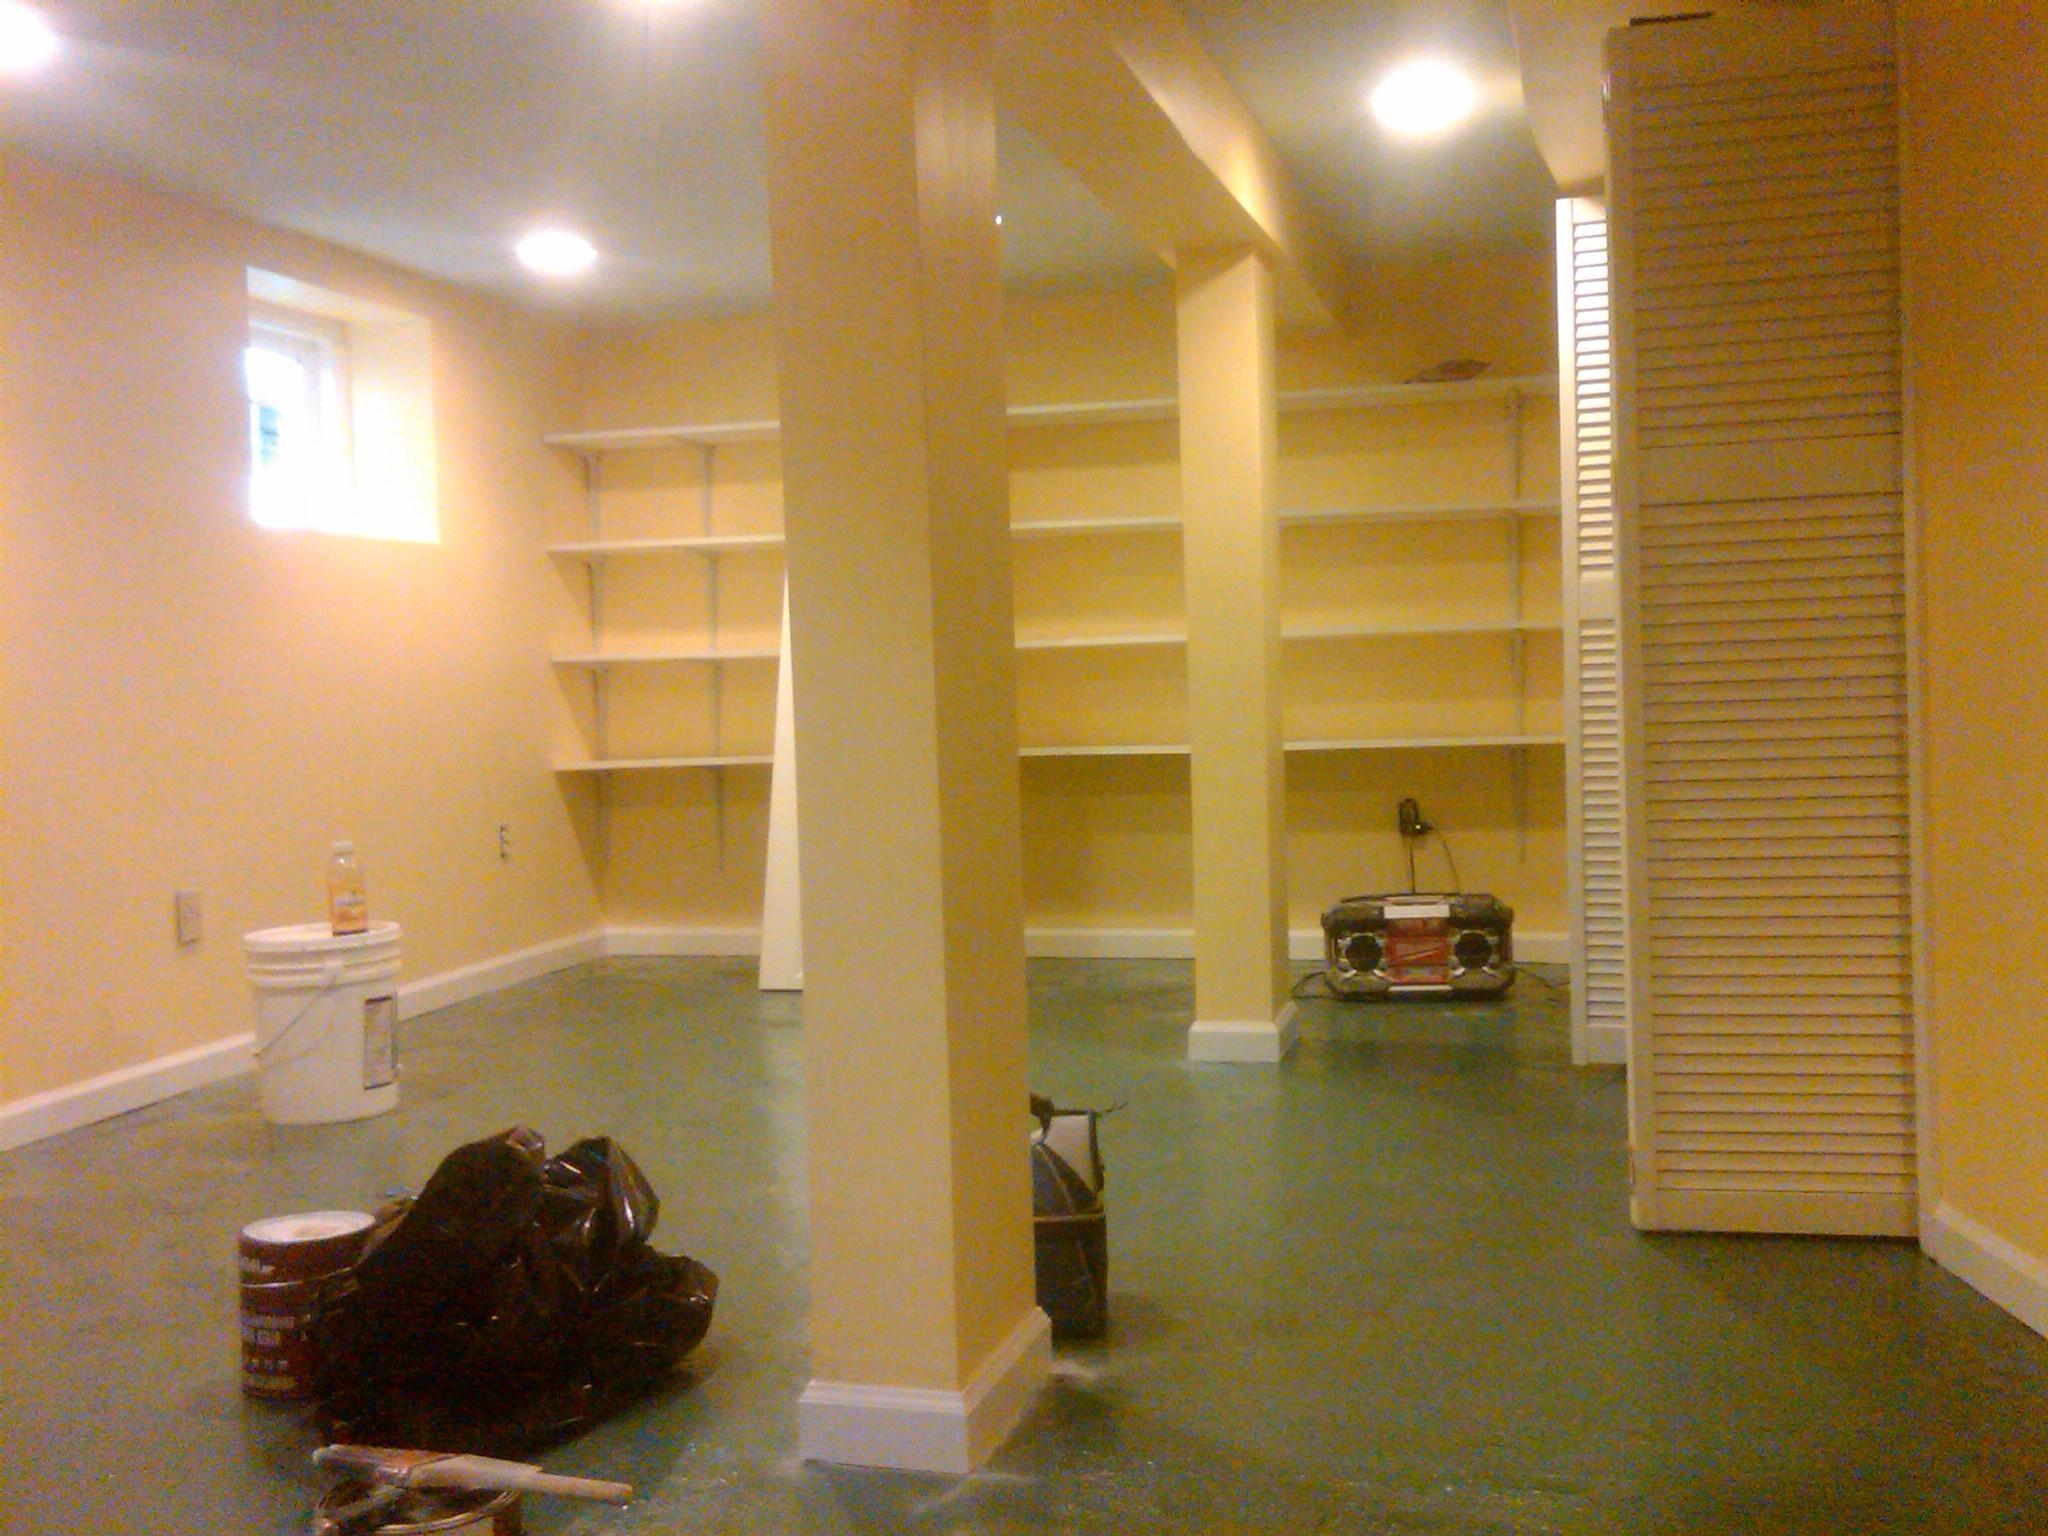 0f67e3947a9e1c79baf5_basement_remodeling_ceiling__walls__floor.jpg